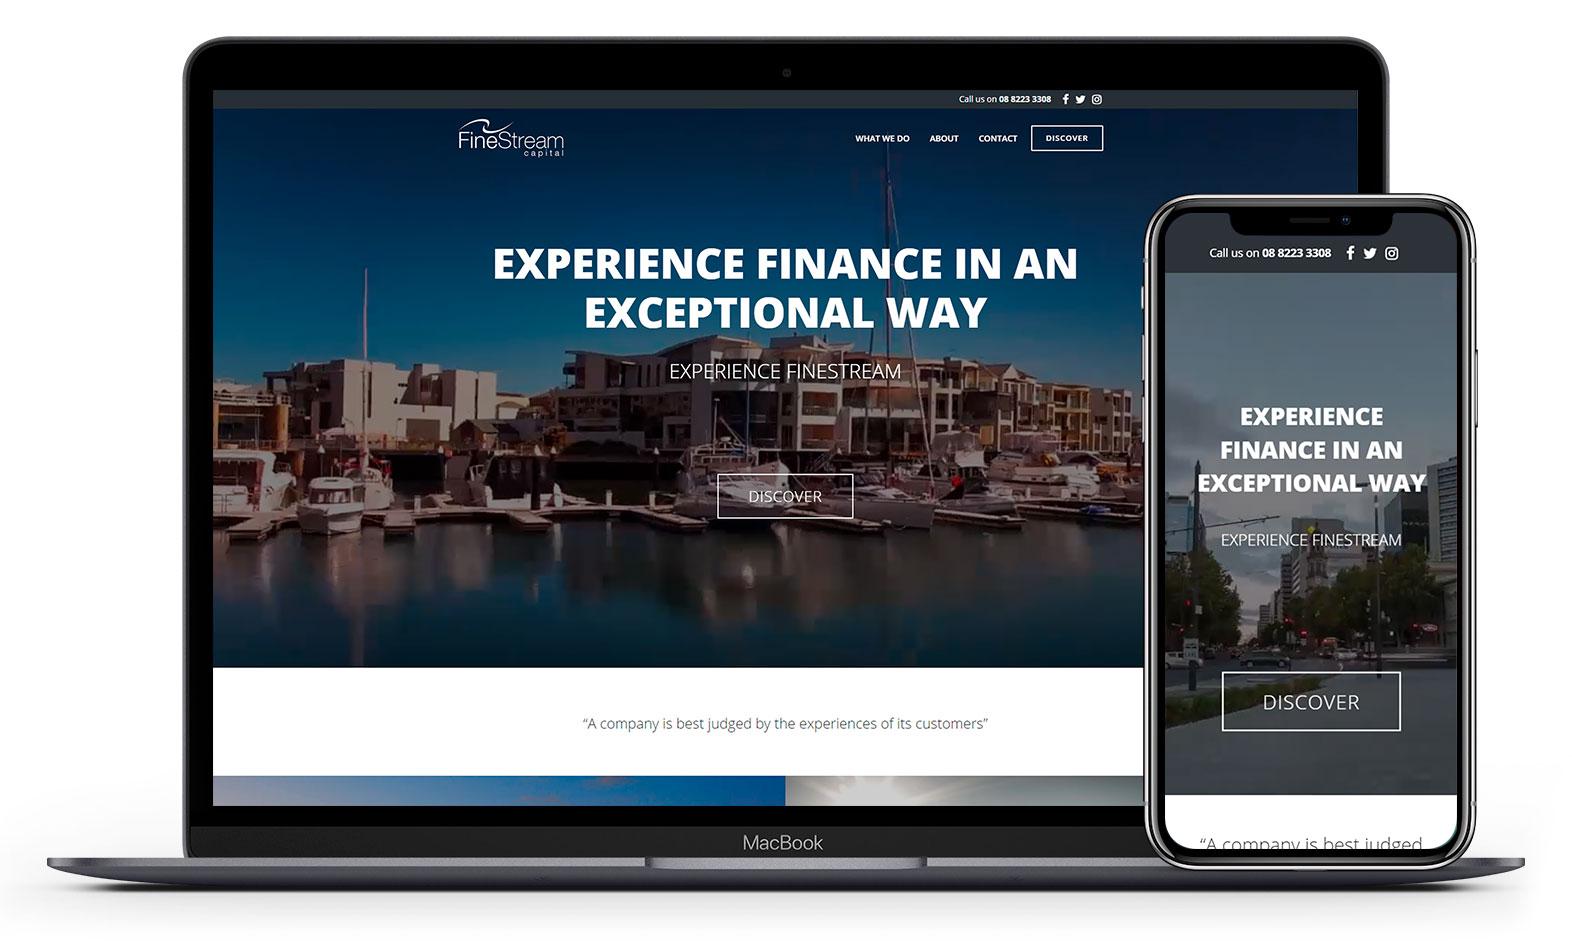 Finestream Capital's website design displayed responsive devices